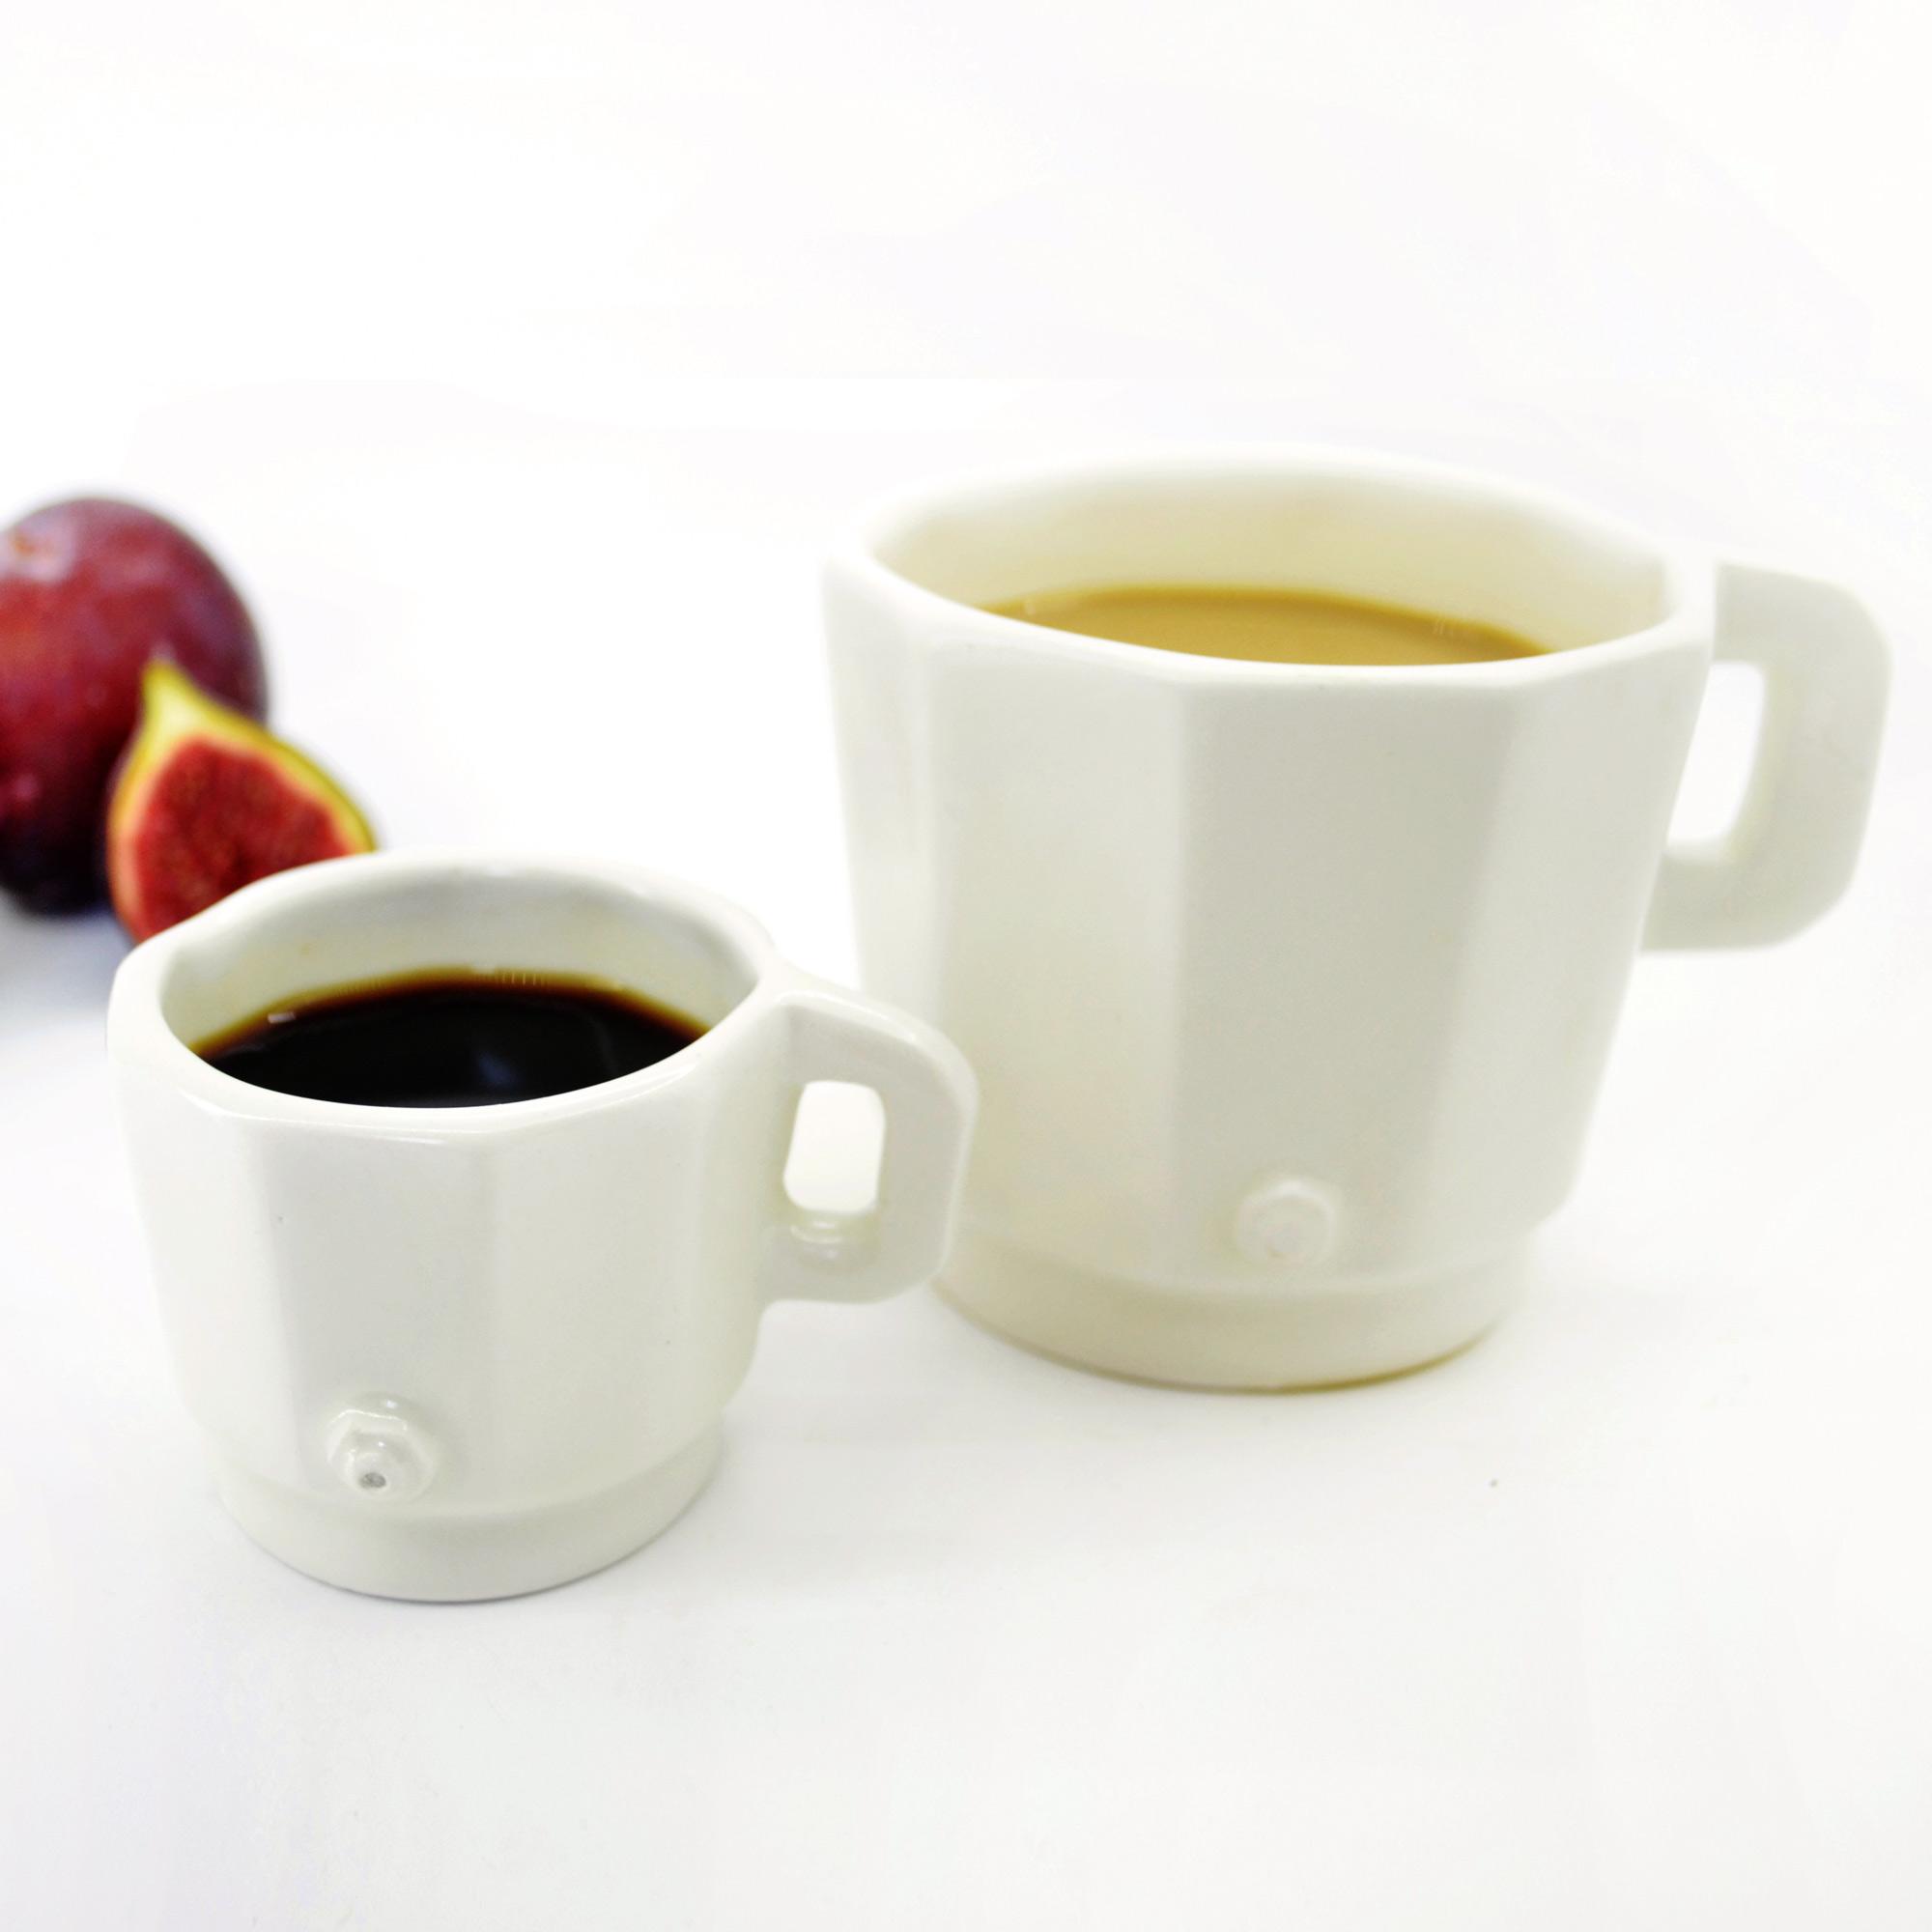 arte artesania taza artesana de diseño de calidad fabricada a mano